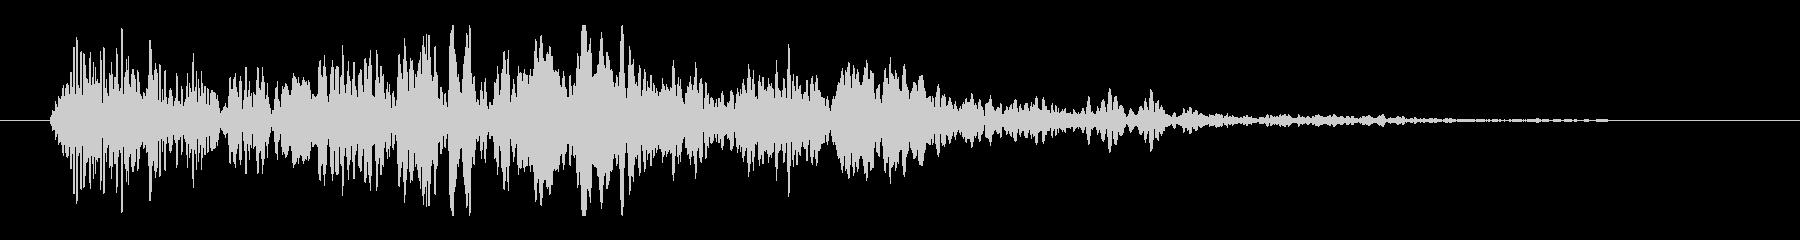 FX エイリアンアラームシグナル01の未再生の波形